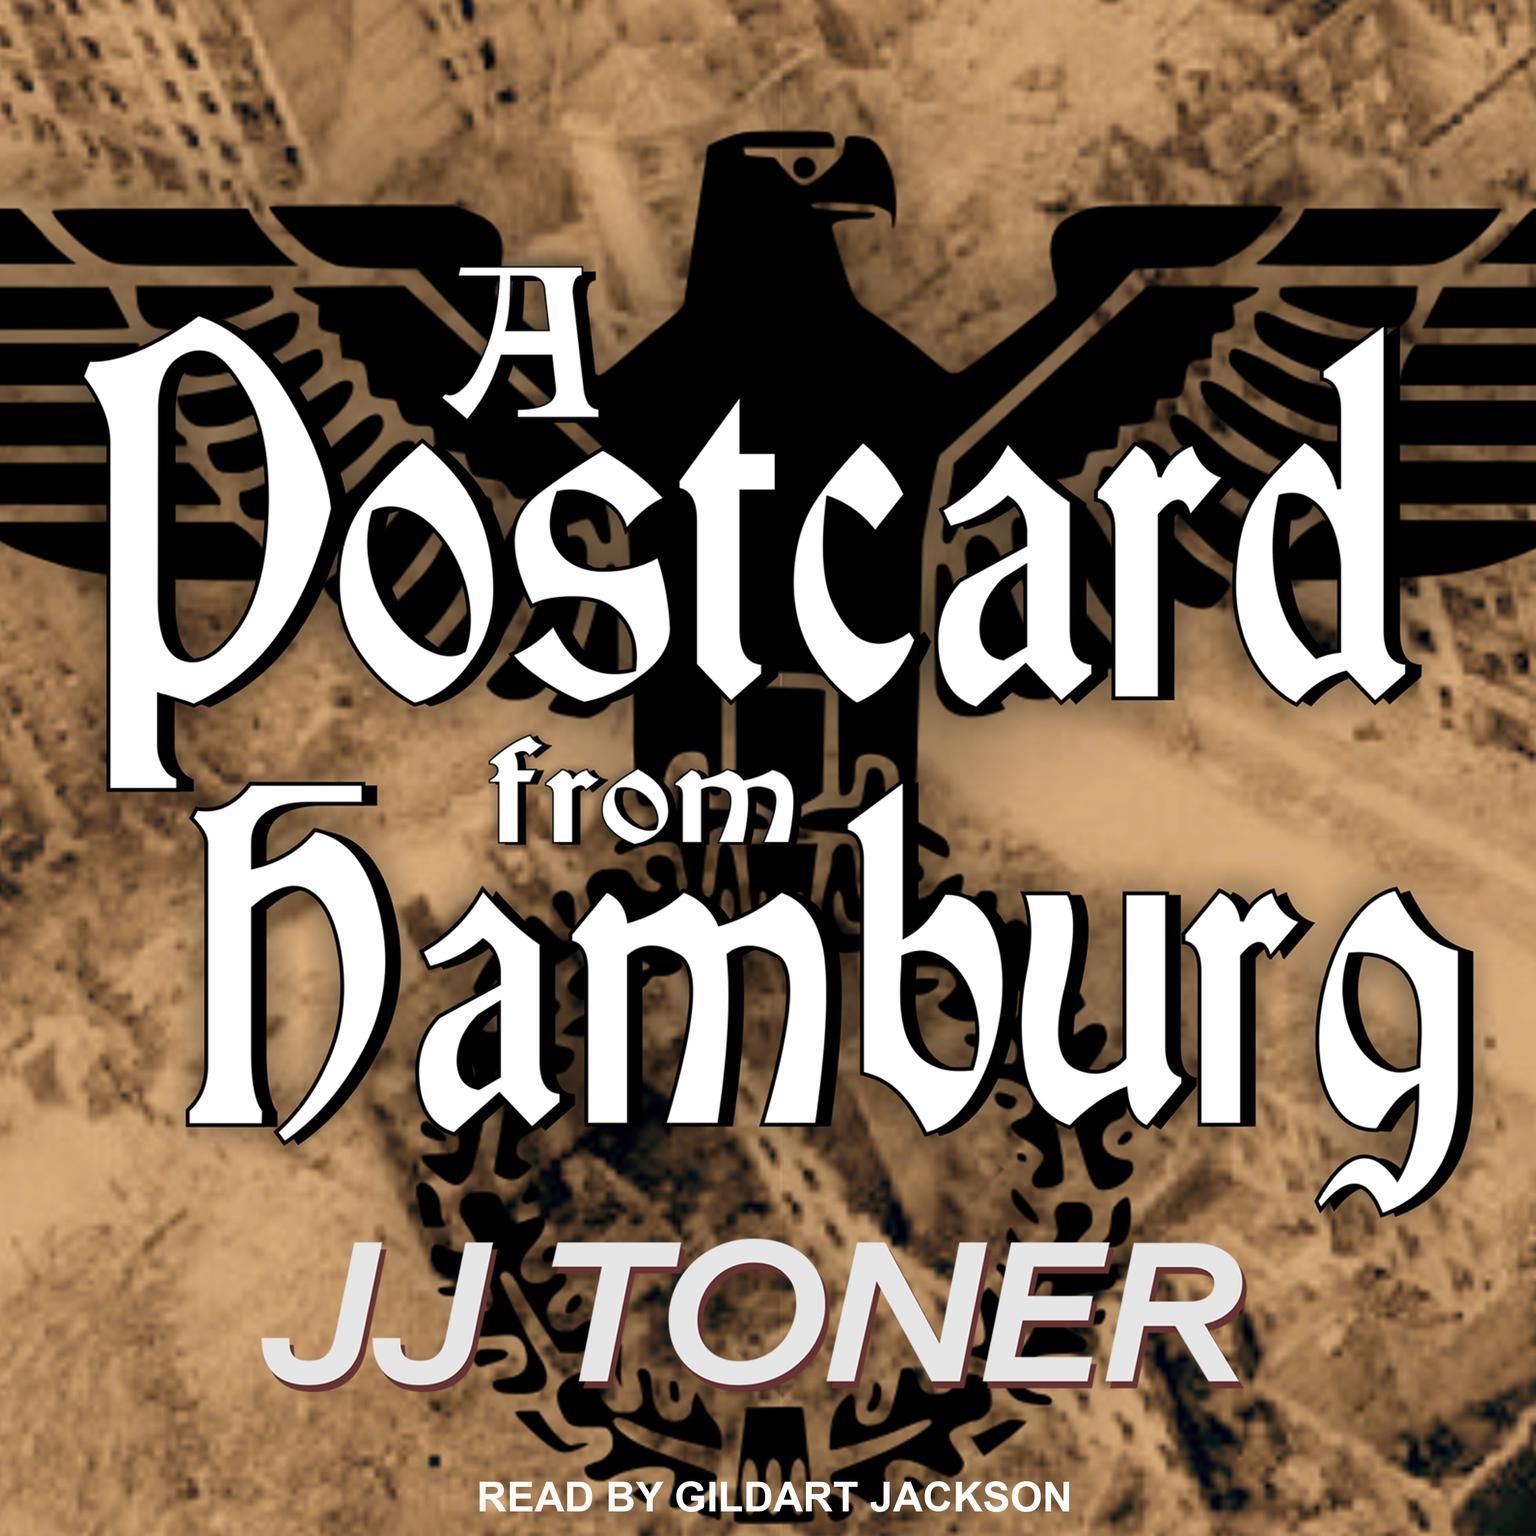 A Postcard from Hamburg: A WW2 Spy Thriller Audiobook, by JJ Toner